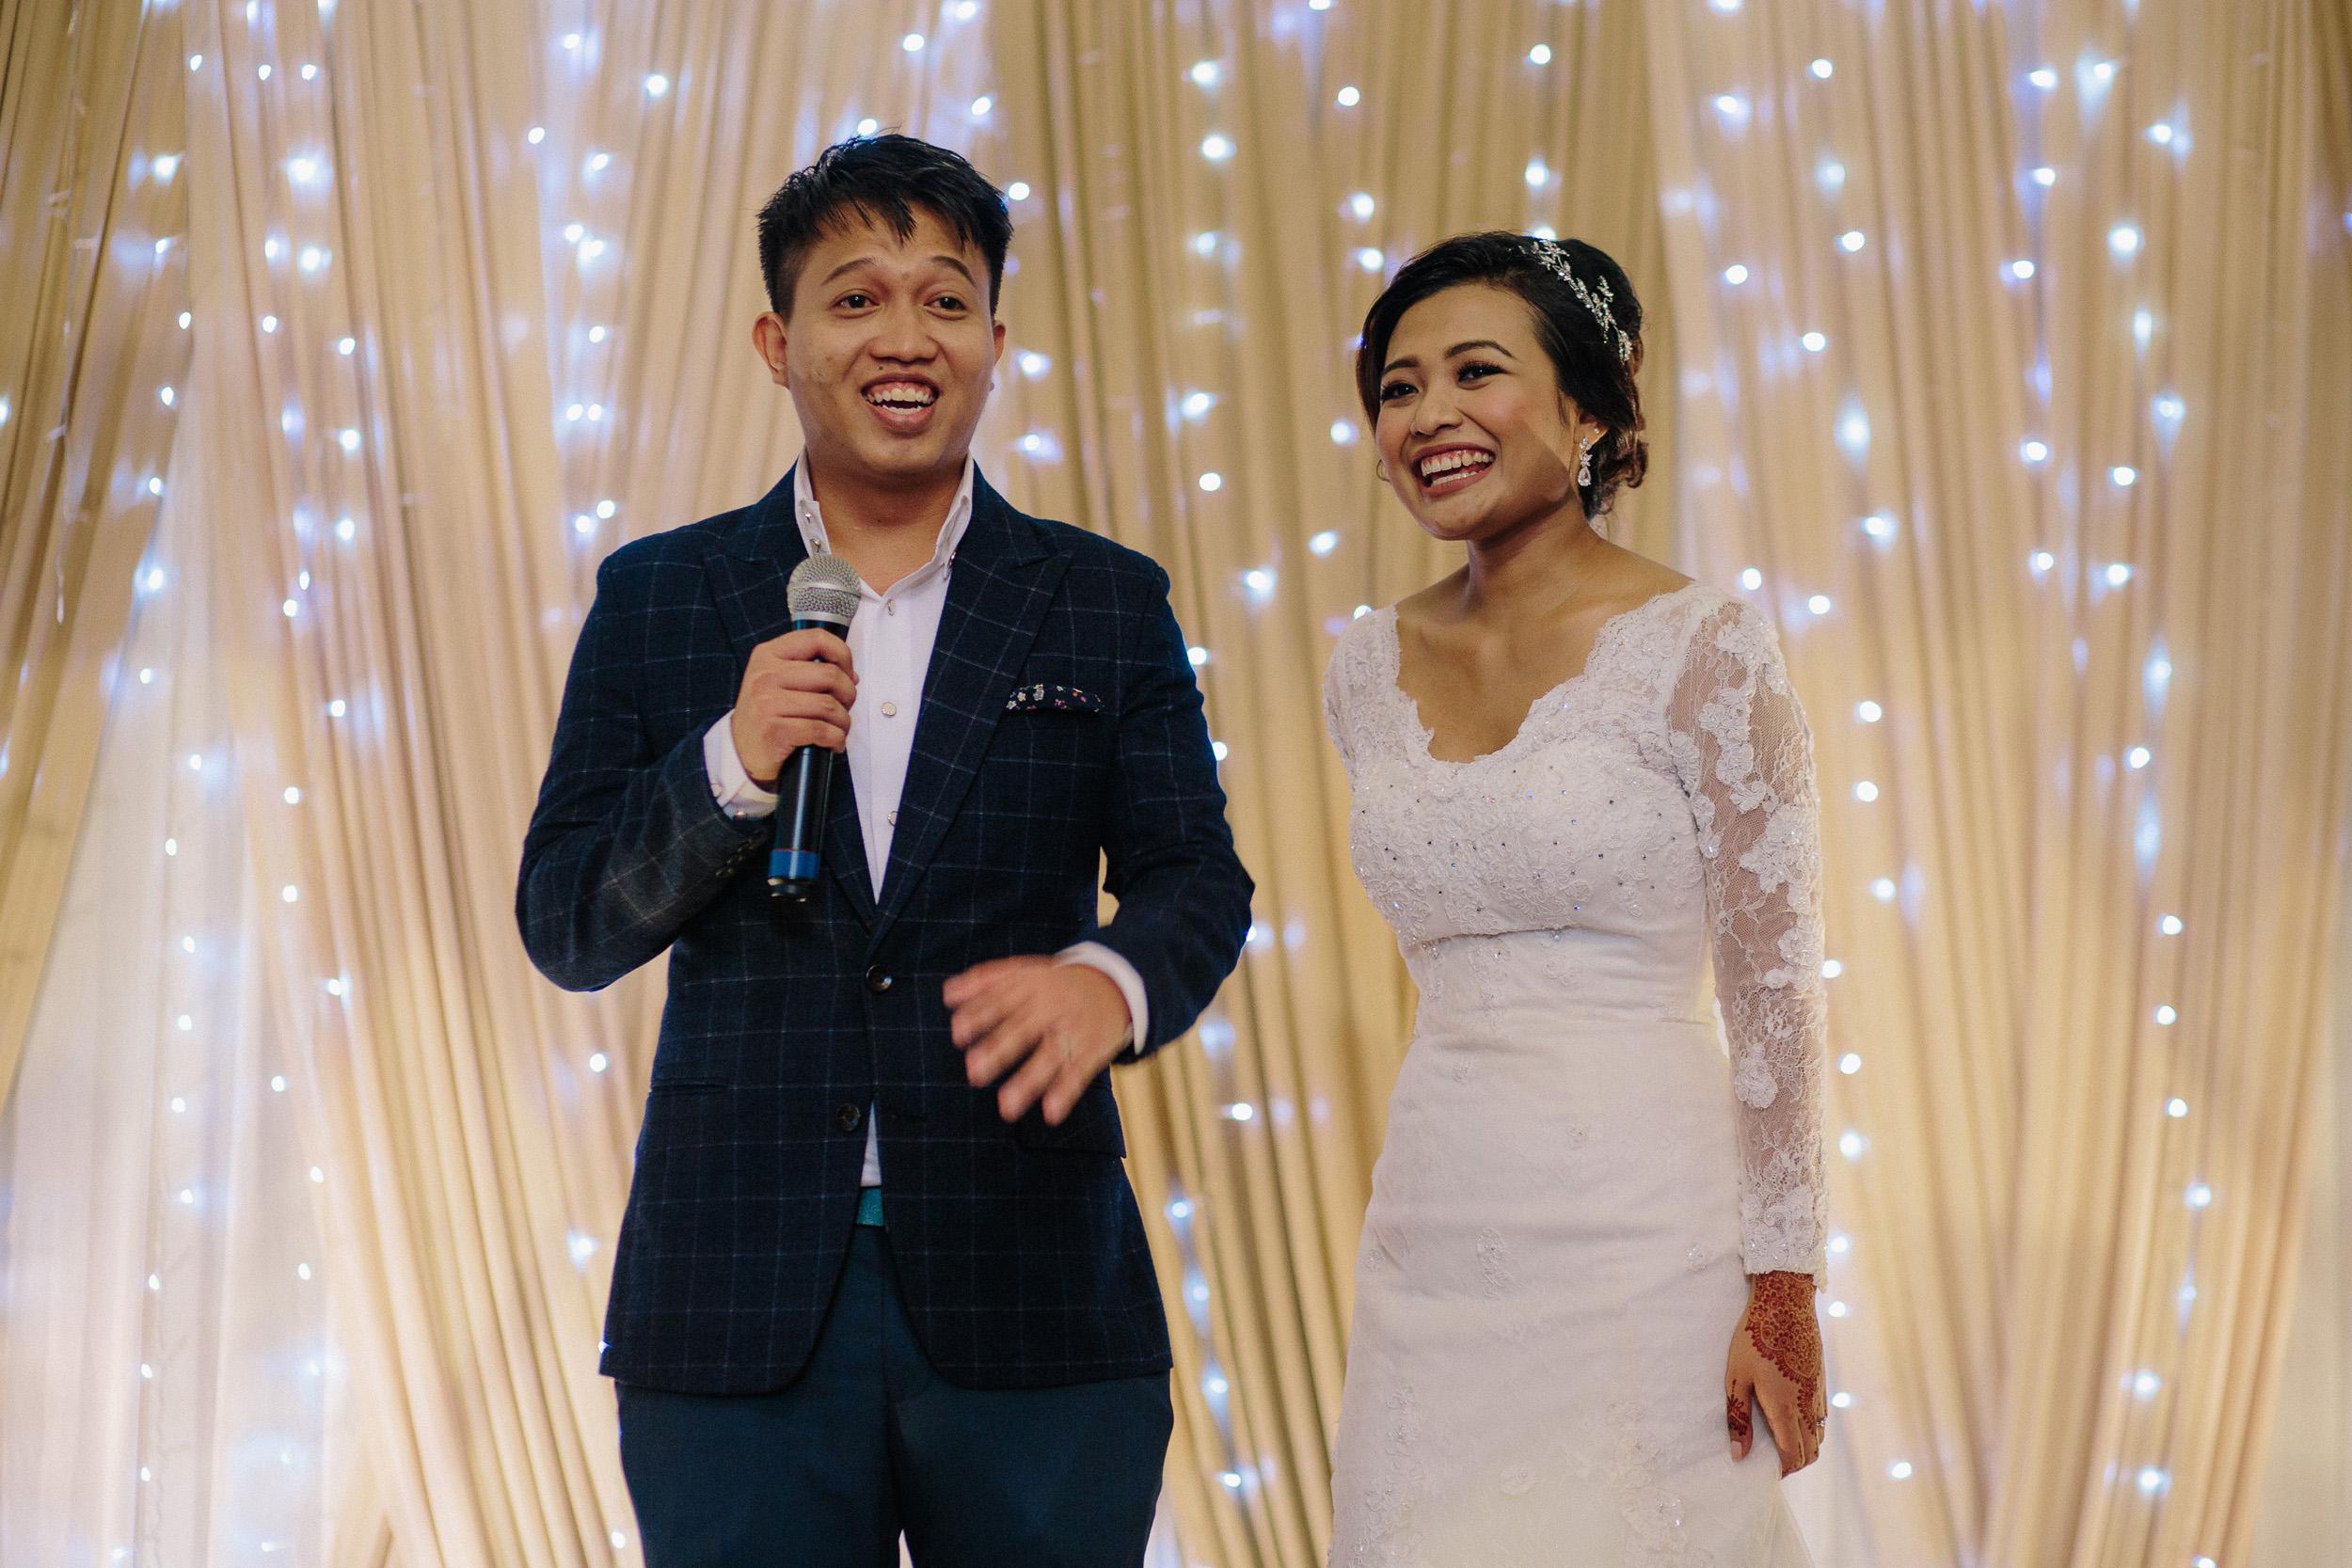 singapore-wedding-photographer-photography-wmt2017-081.jpg